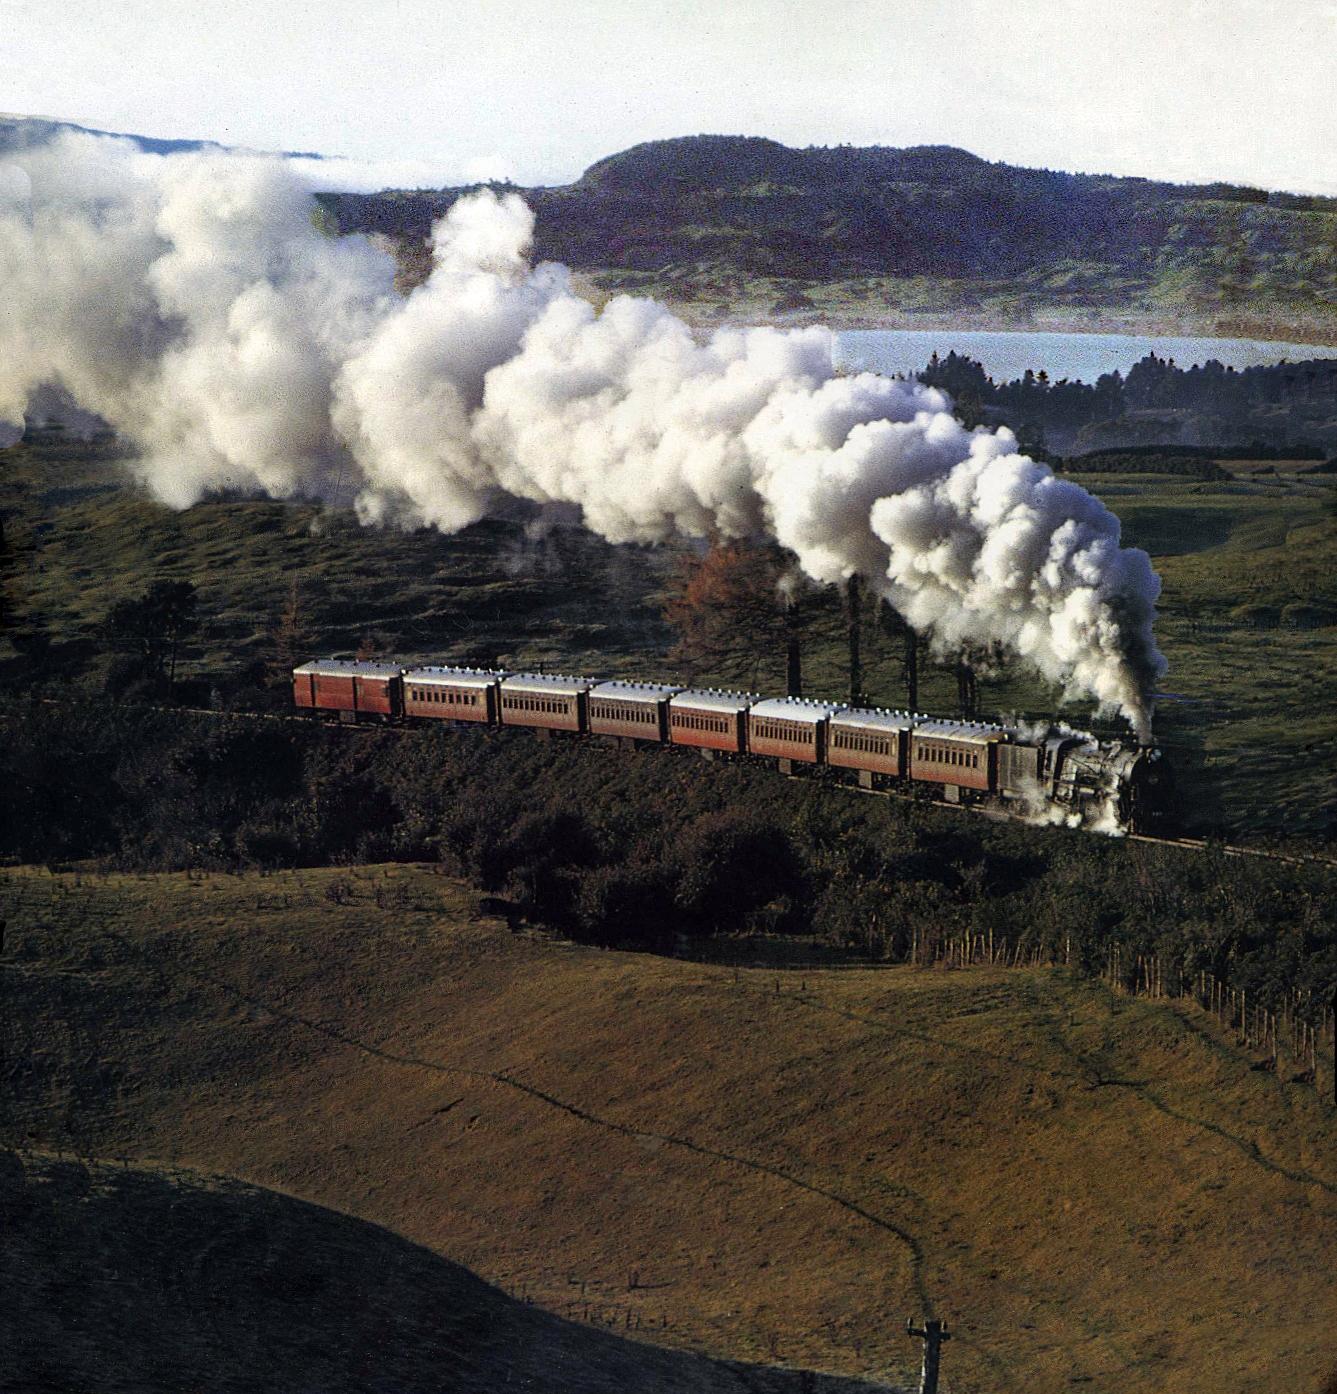 Transpress Nz: Steam Clouds Above Lake Rotorua